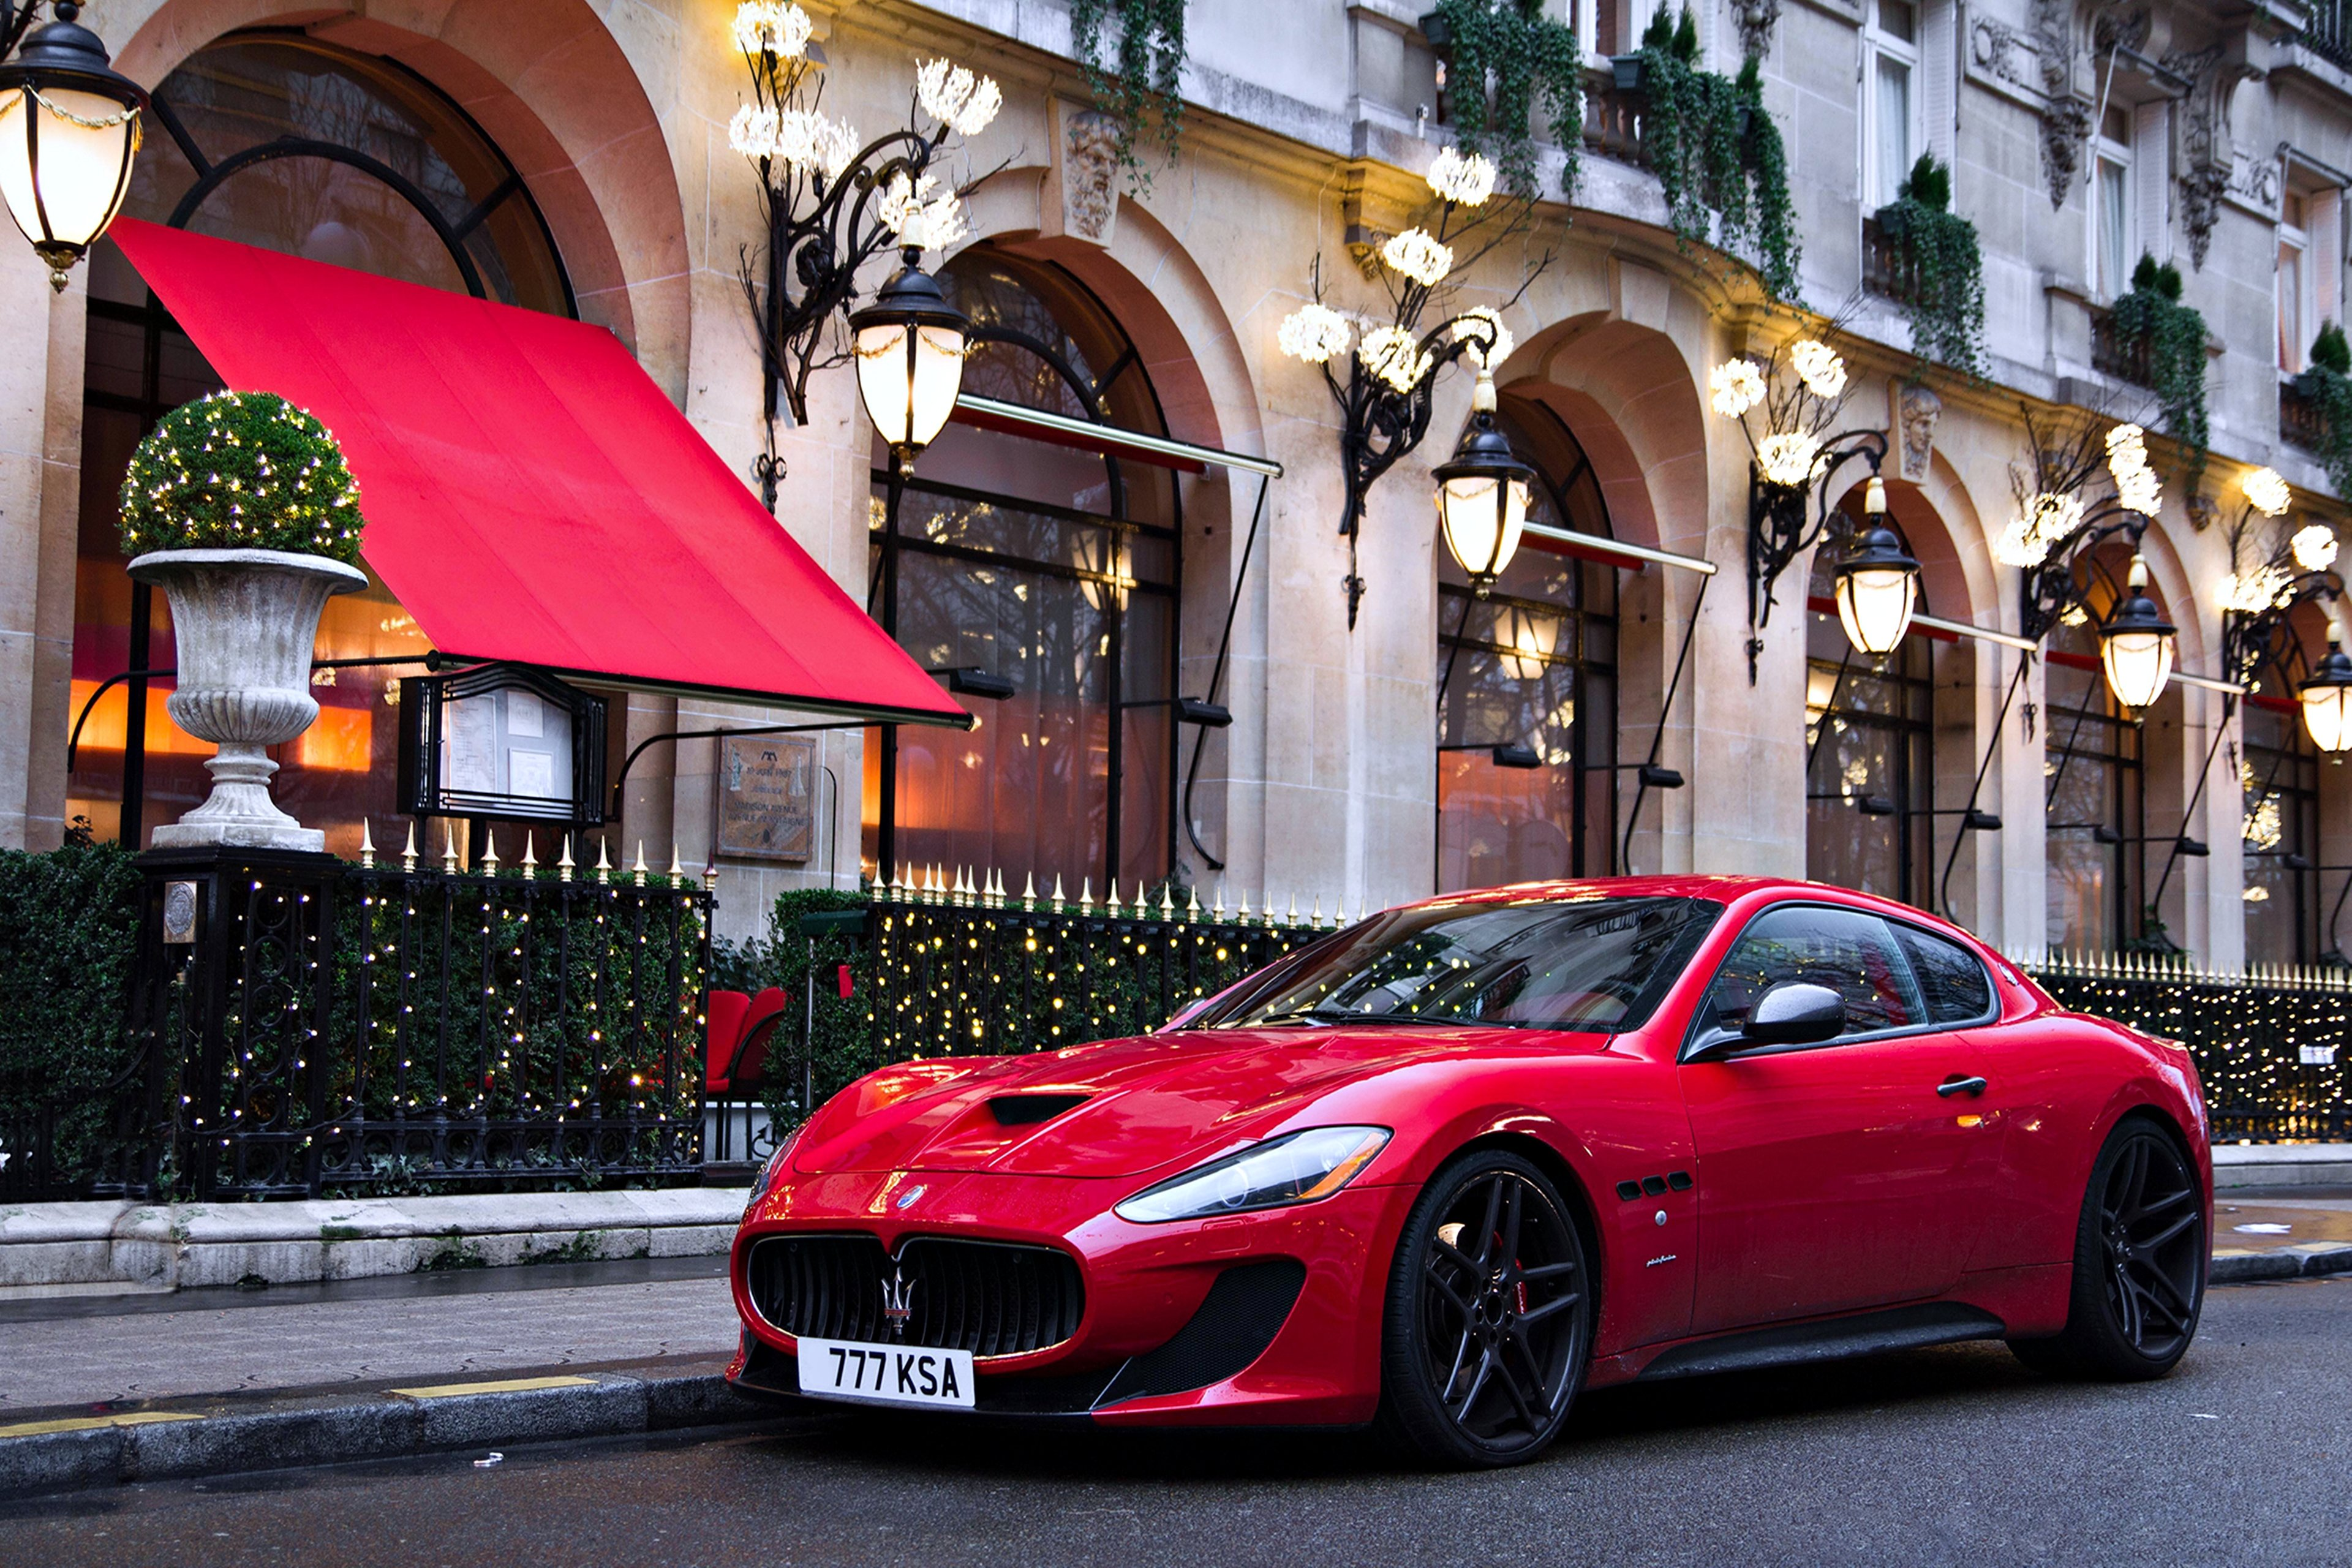 Maserati gran gurismo red cars city road street lights ...